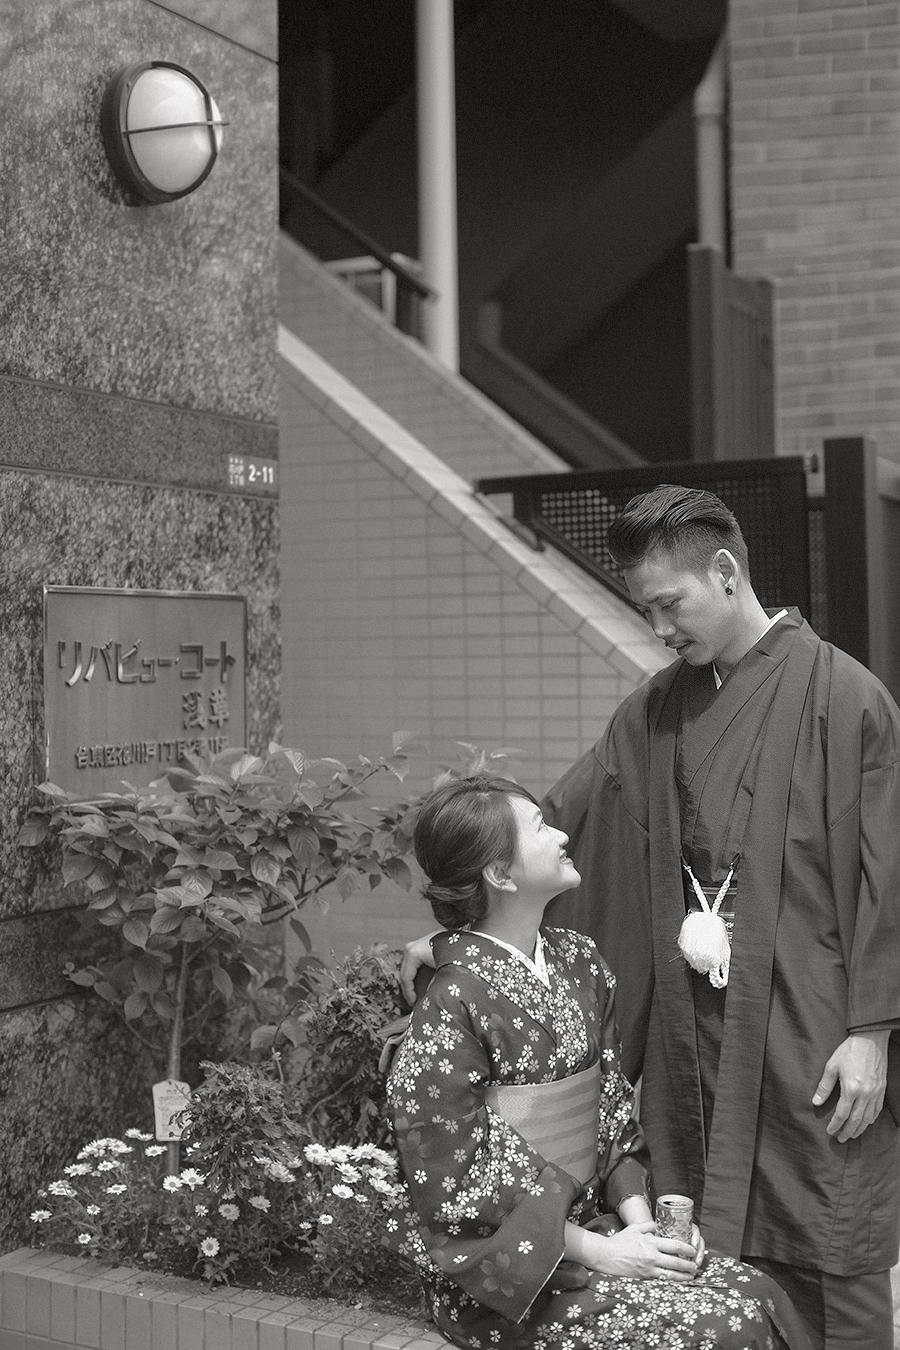 tokyo hakone japan spring sakura . engagement wedding photography by kurt ahs . ns + eu . 0405.jpg